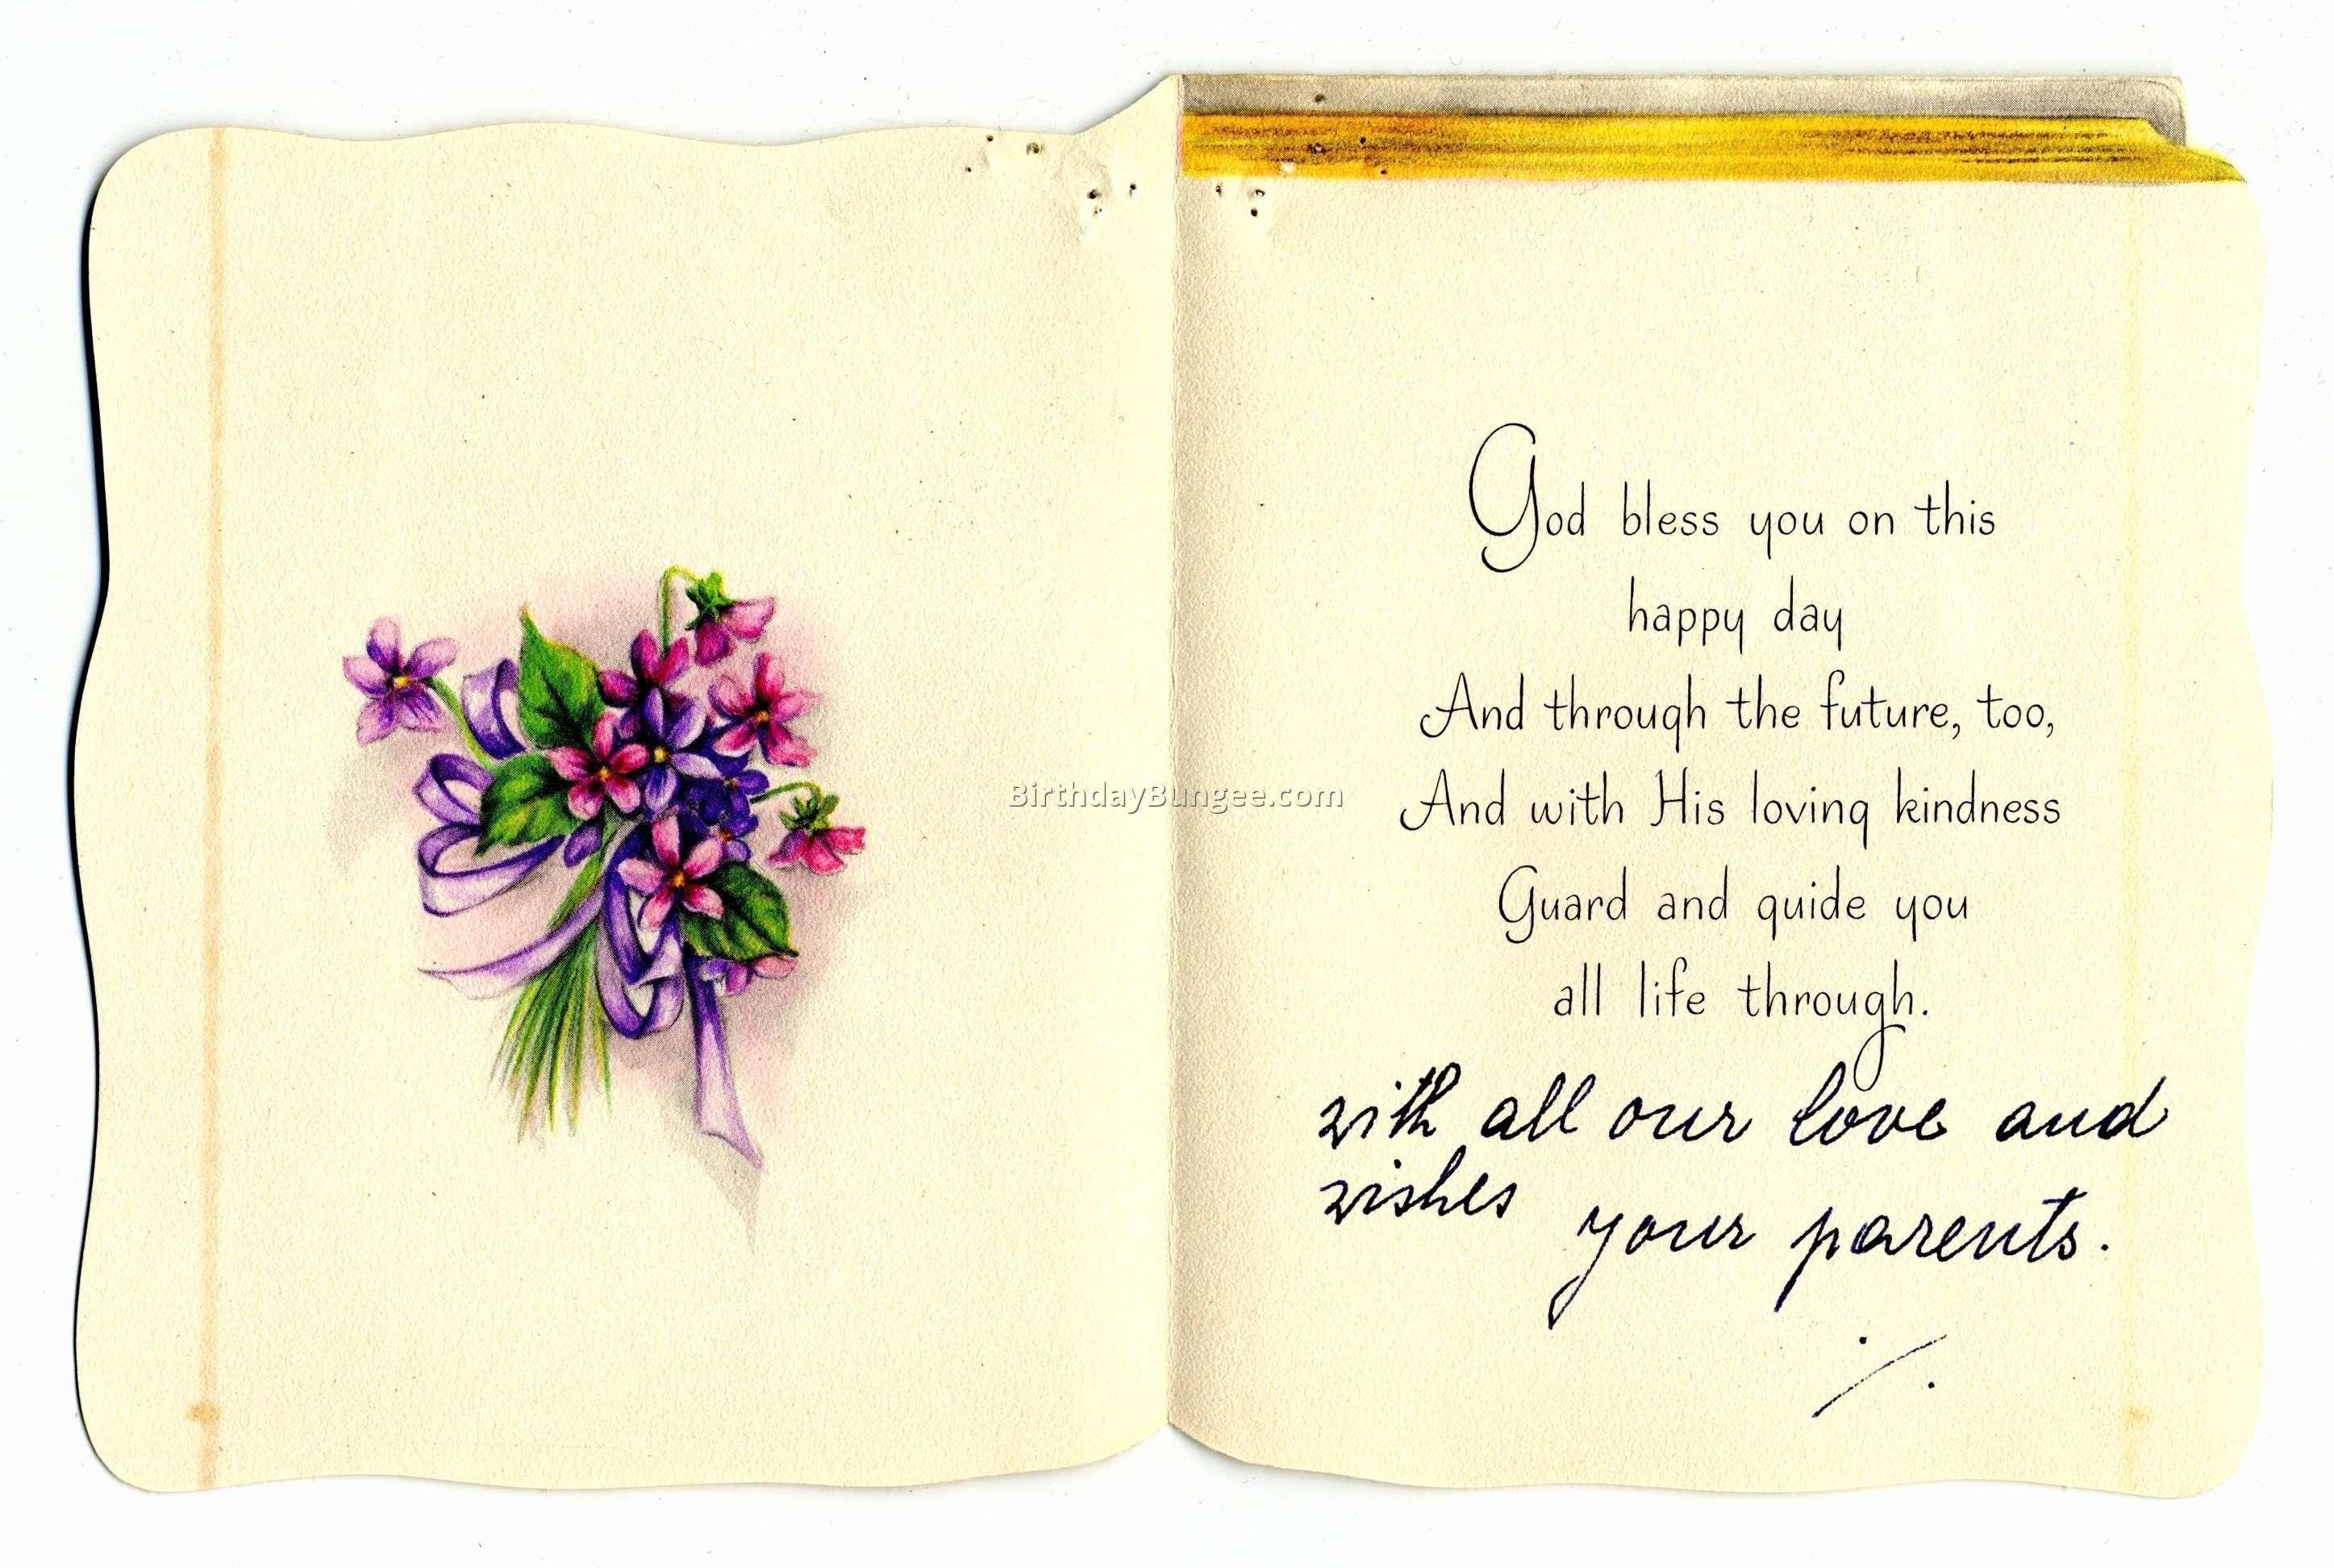 Percy Jackson Birthday Card Best Happy Birthday Card Messages Unique Best Happy Birthday Card